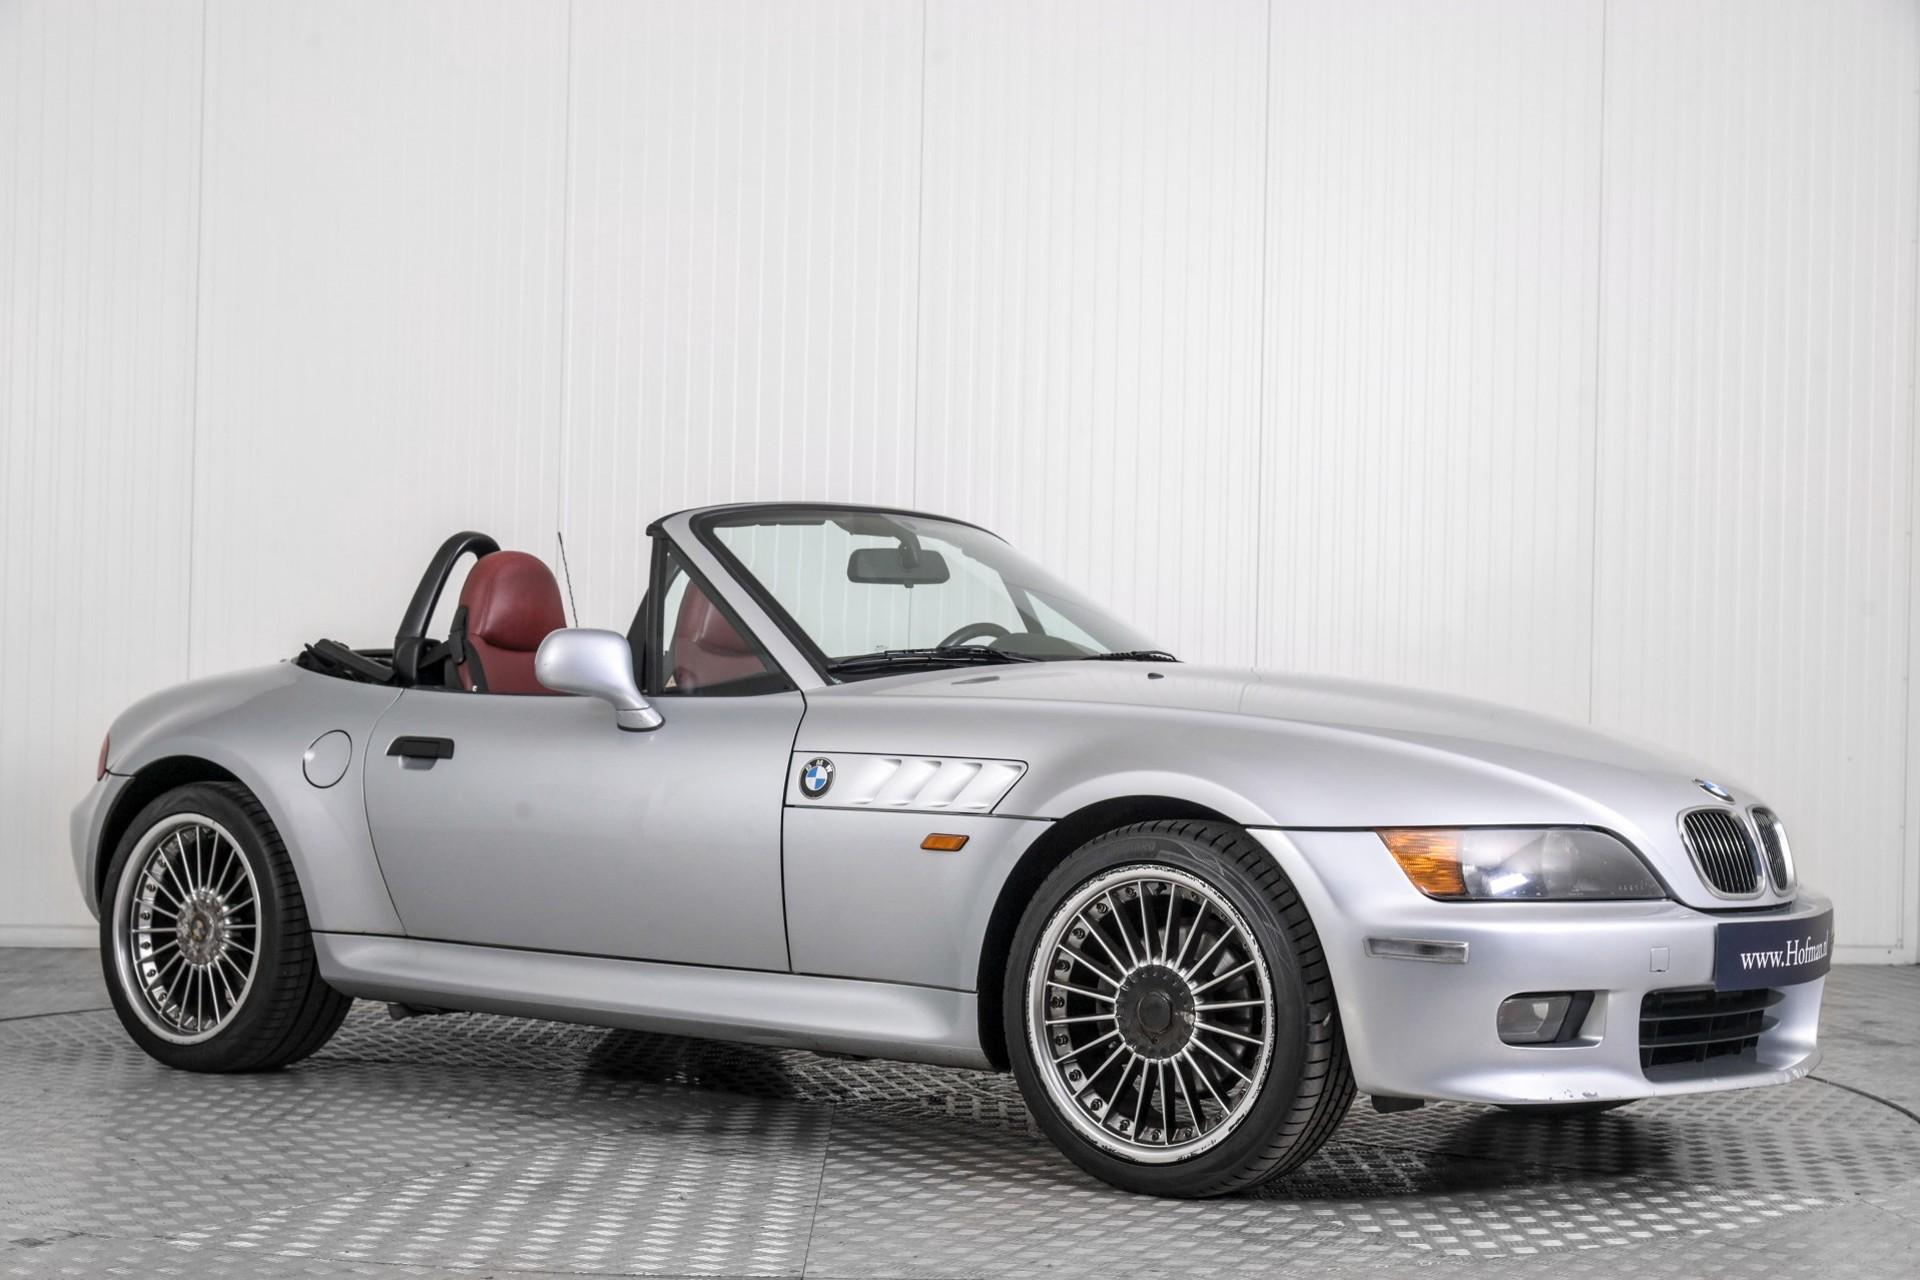 BMW Z3 Roadster 2.8 Foto 6